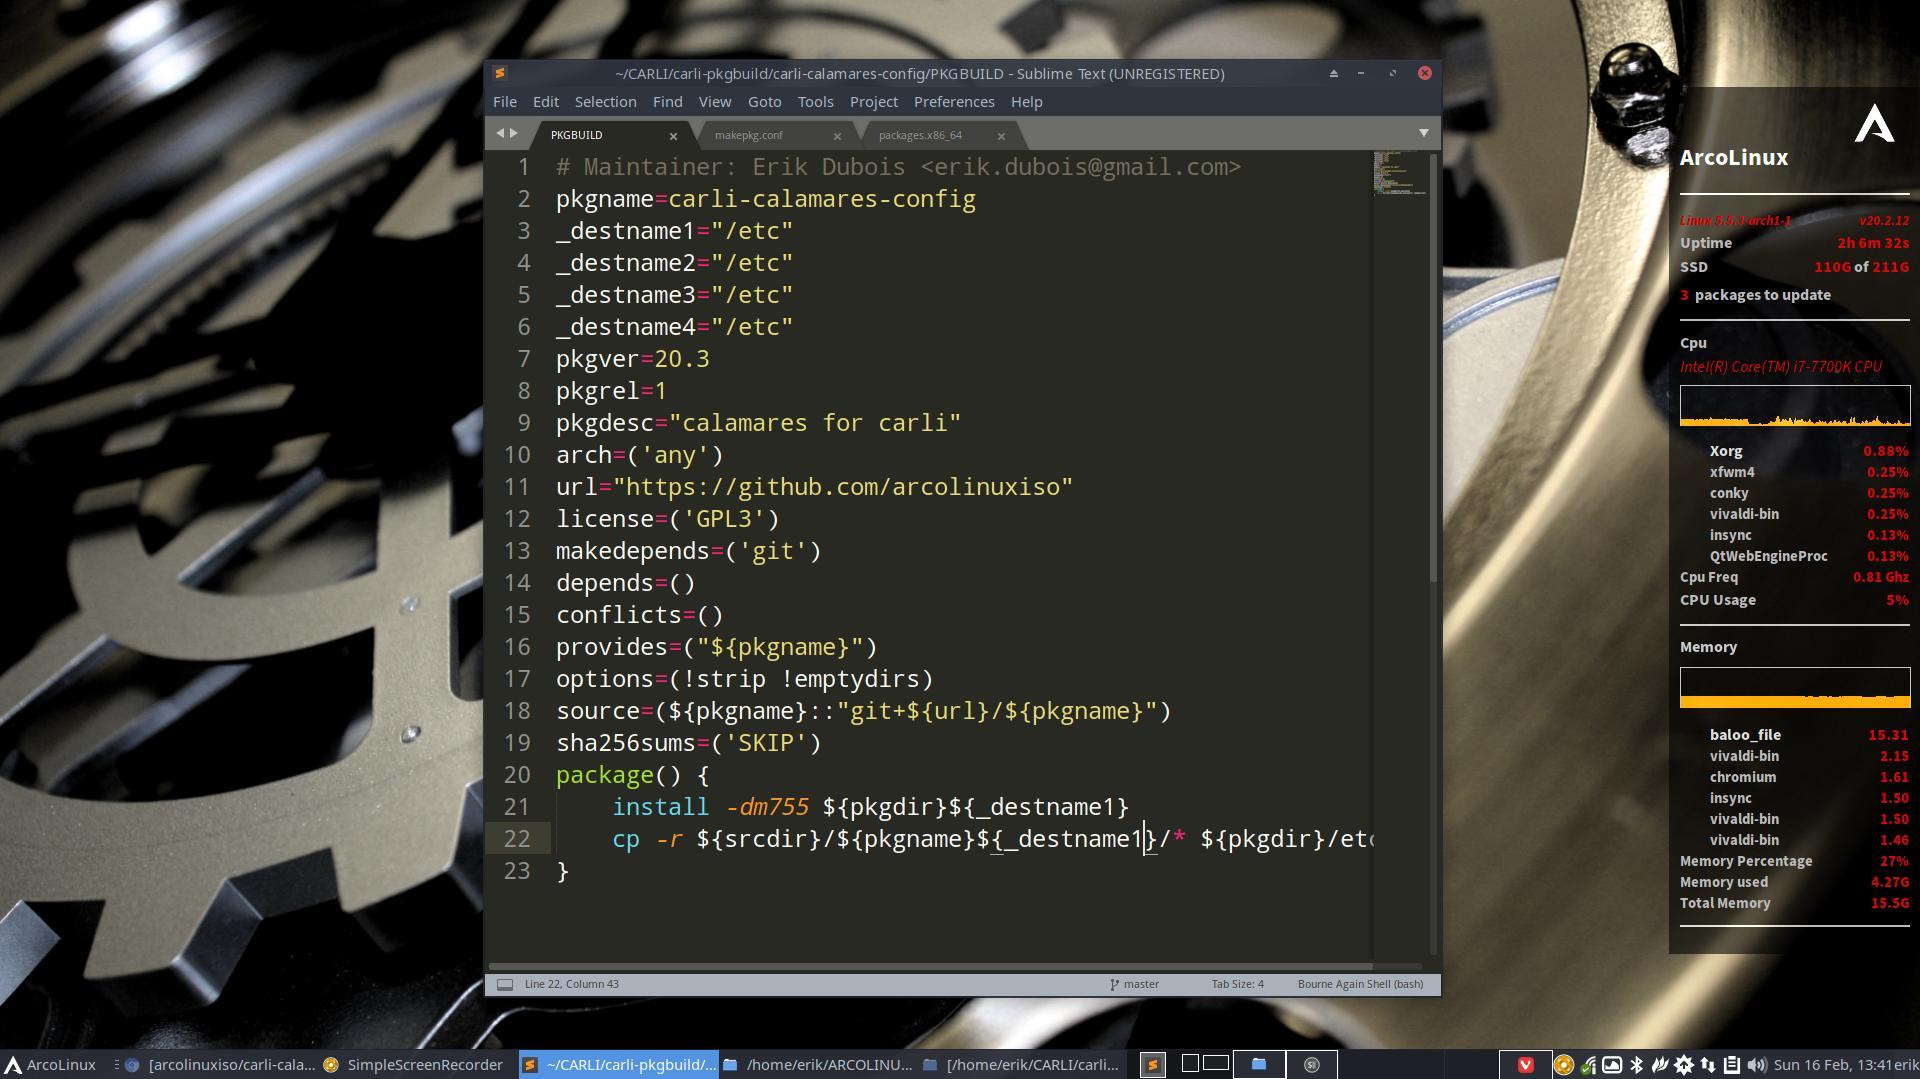 10 Creating a pkgbuild for Calamares config